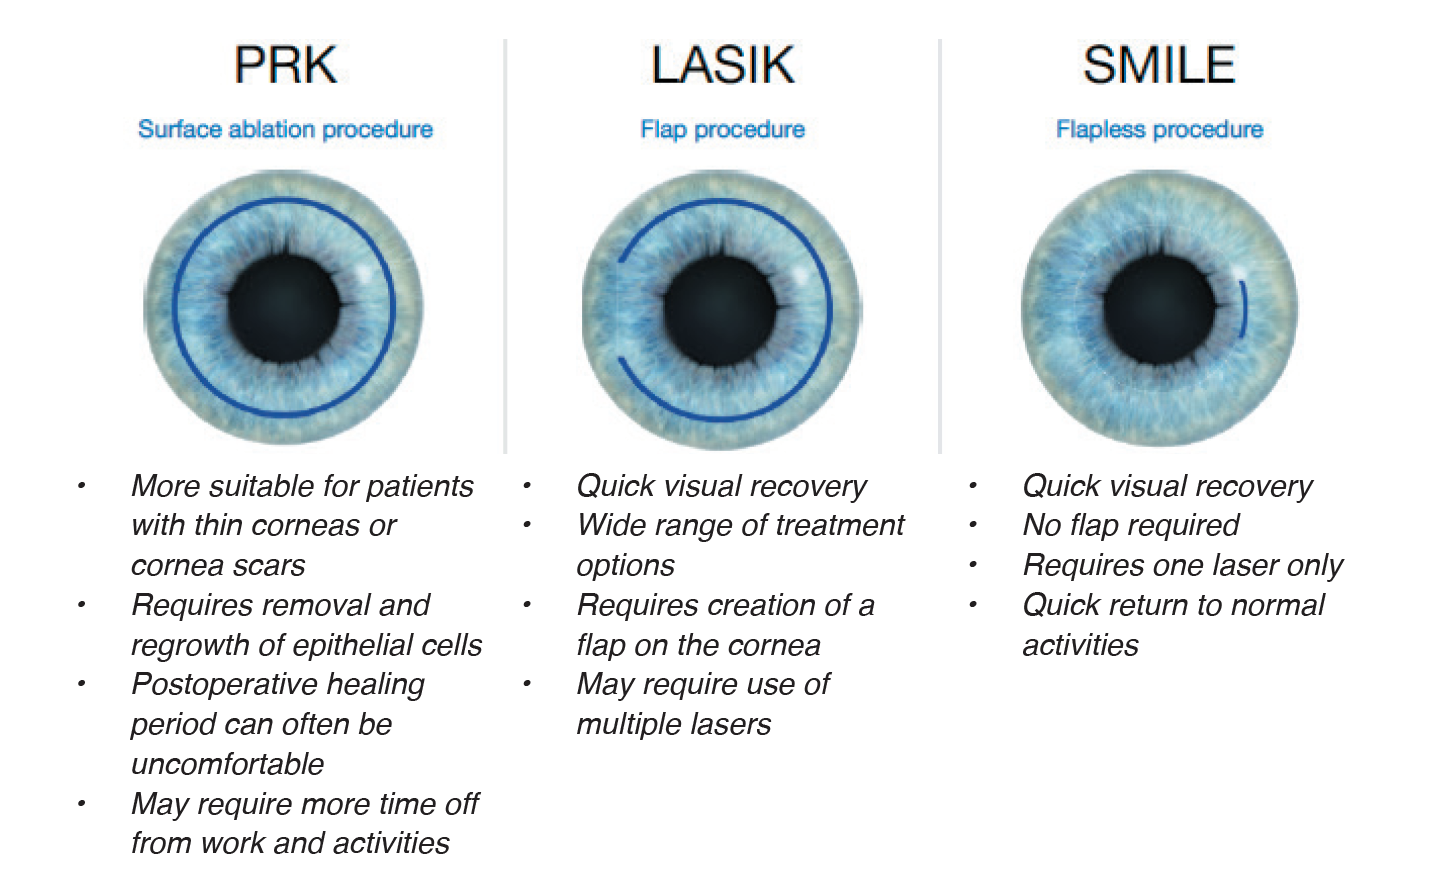 Comparison of PRK (surface ablation procedure), LASIK (flap procedure) and SMILE (flapless procedure)